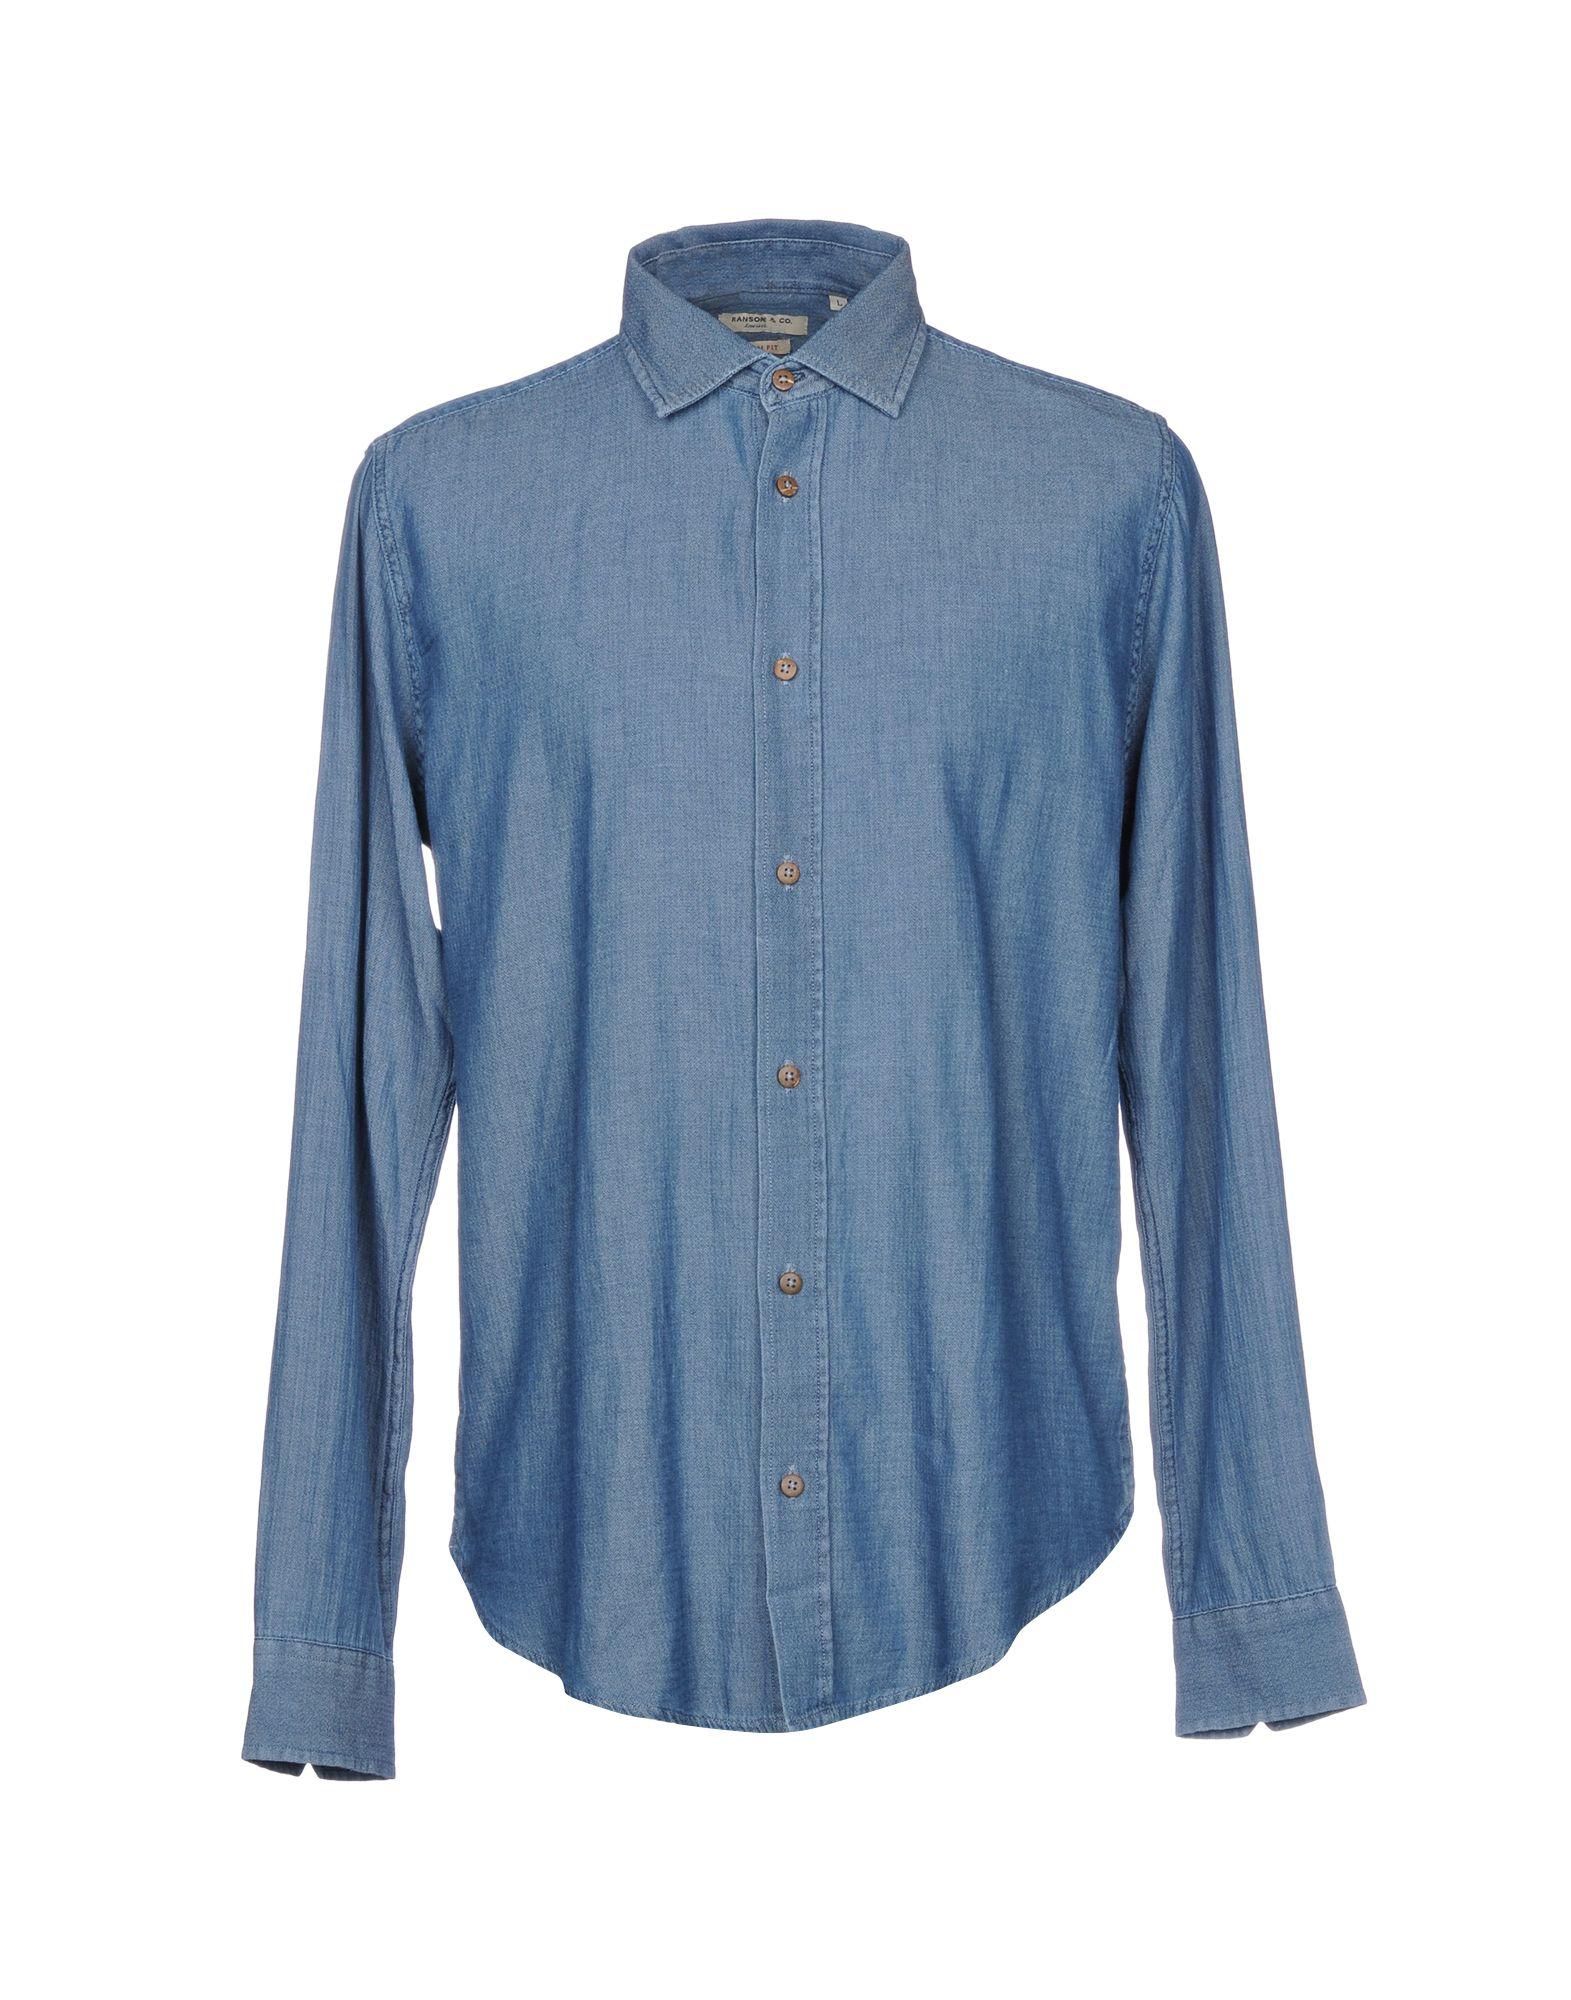 RANSOM Джинсовая рубашка sara craven dark ransom